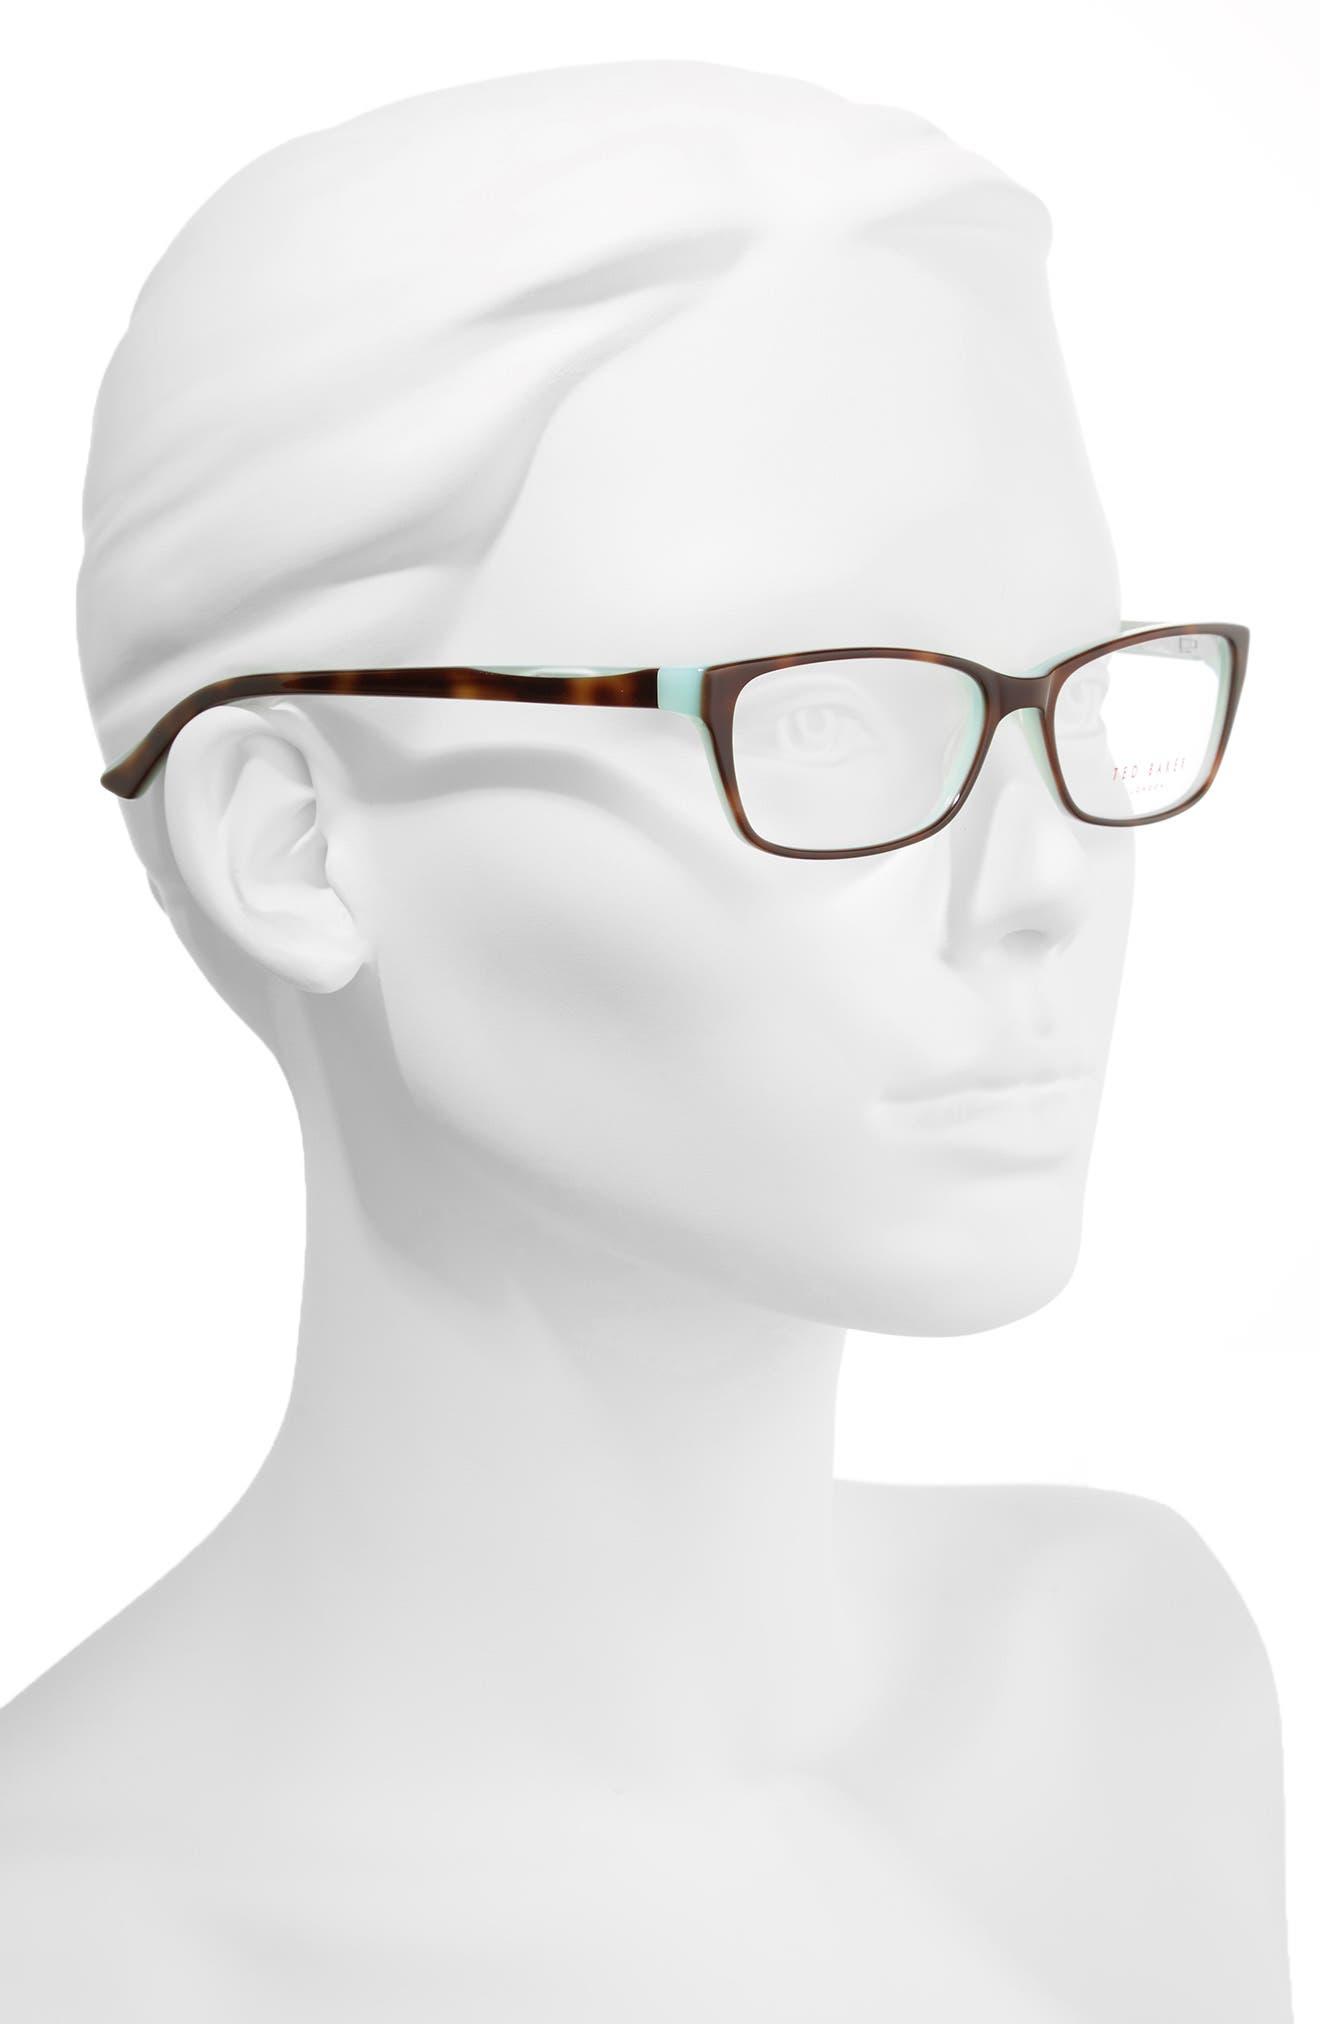 53mm Optical Glasses,                             Alternate thumbnail 2, color,                             Brown